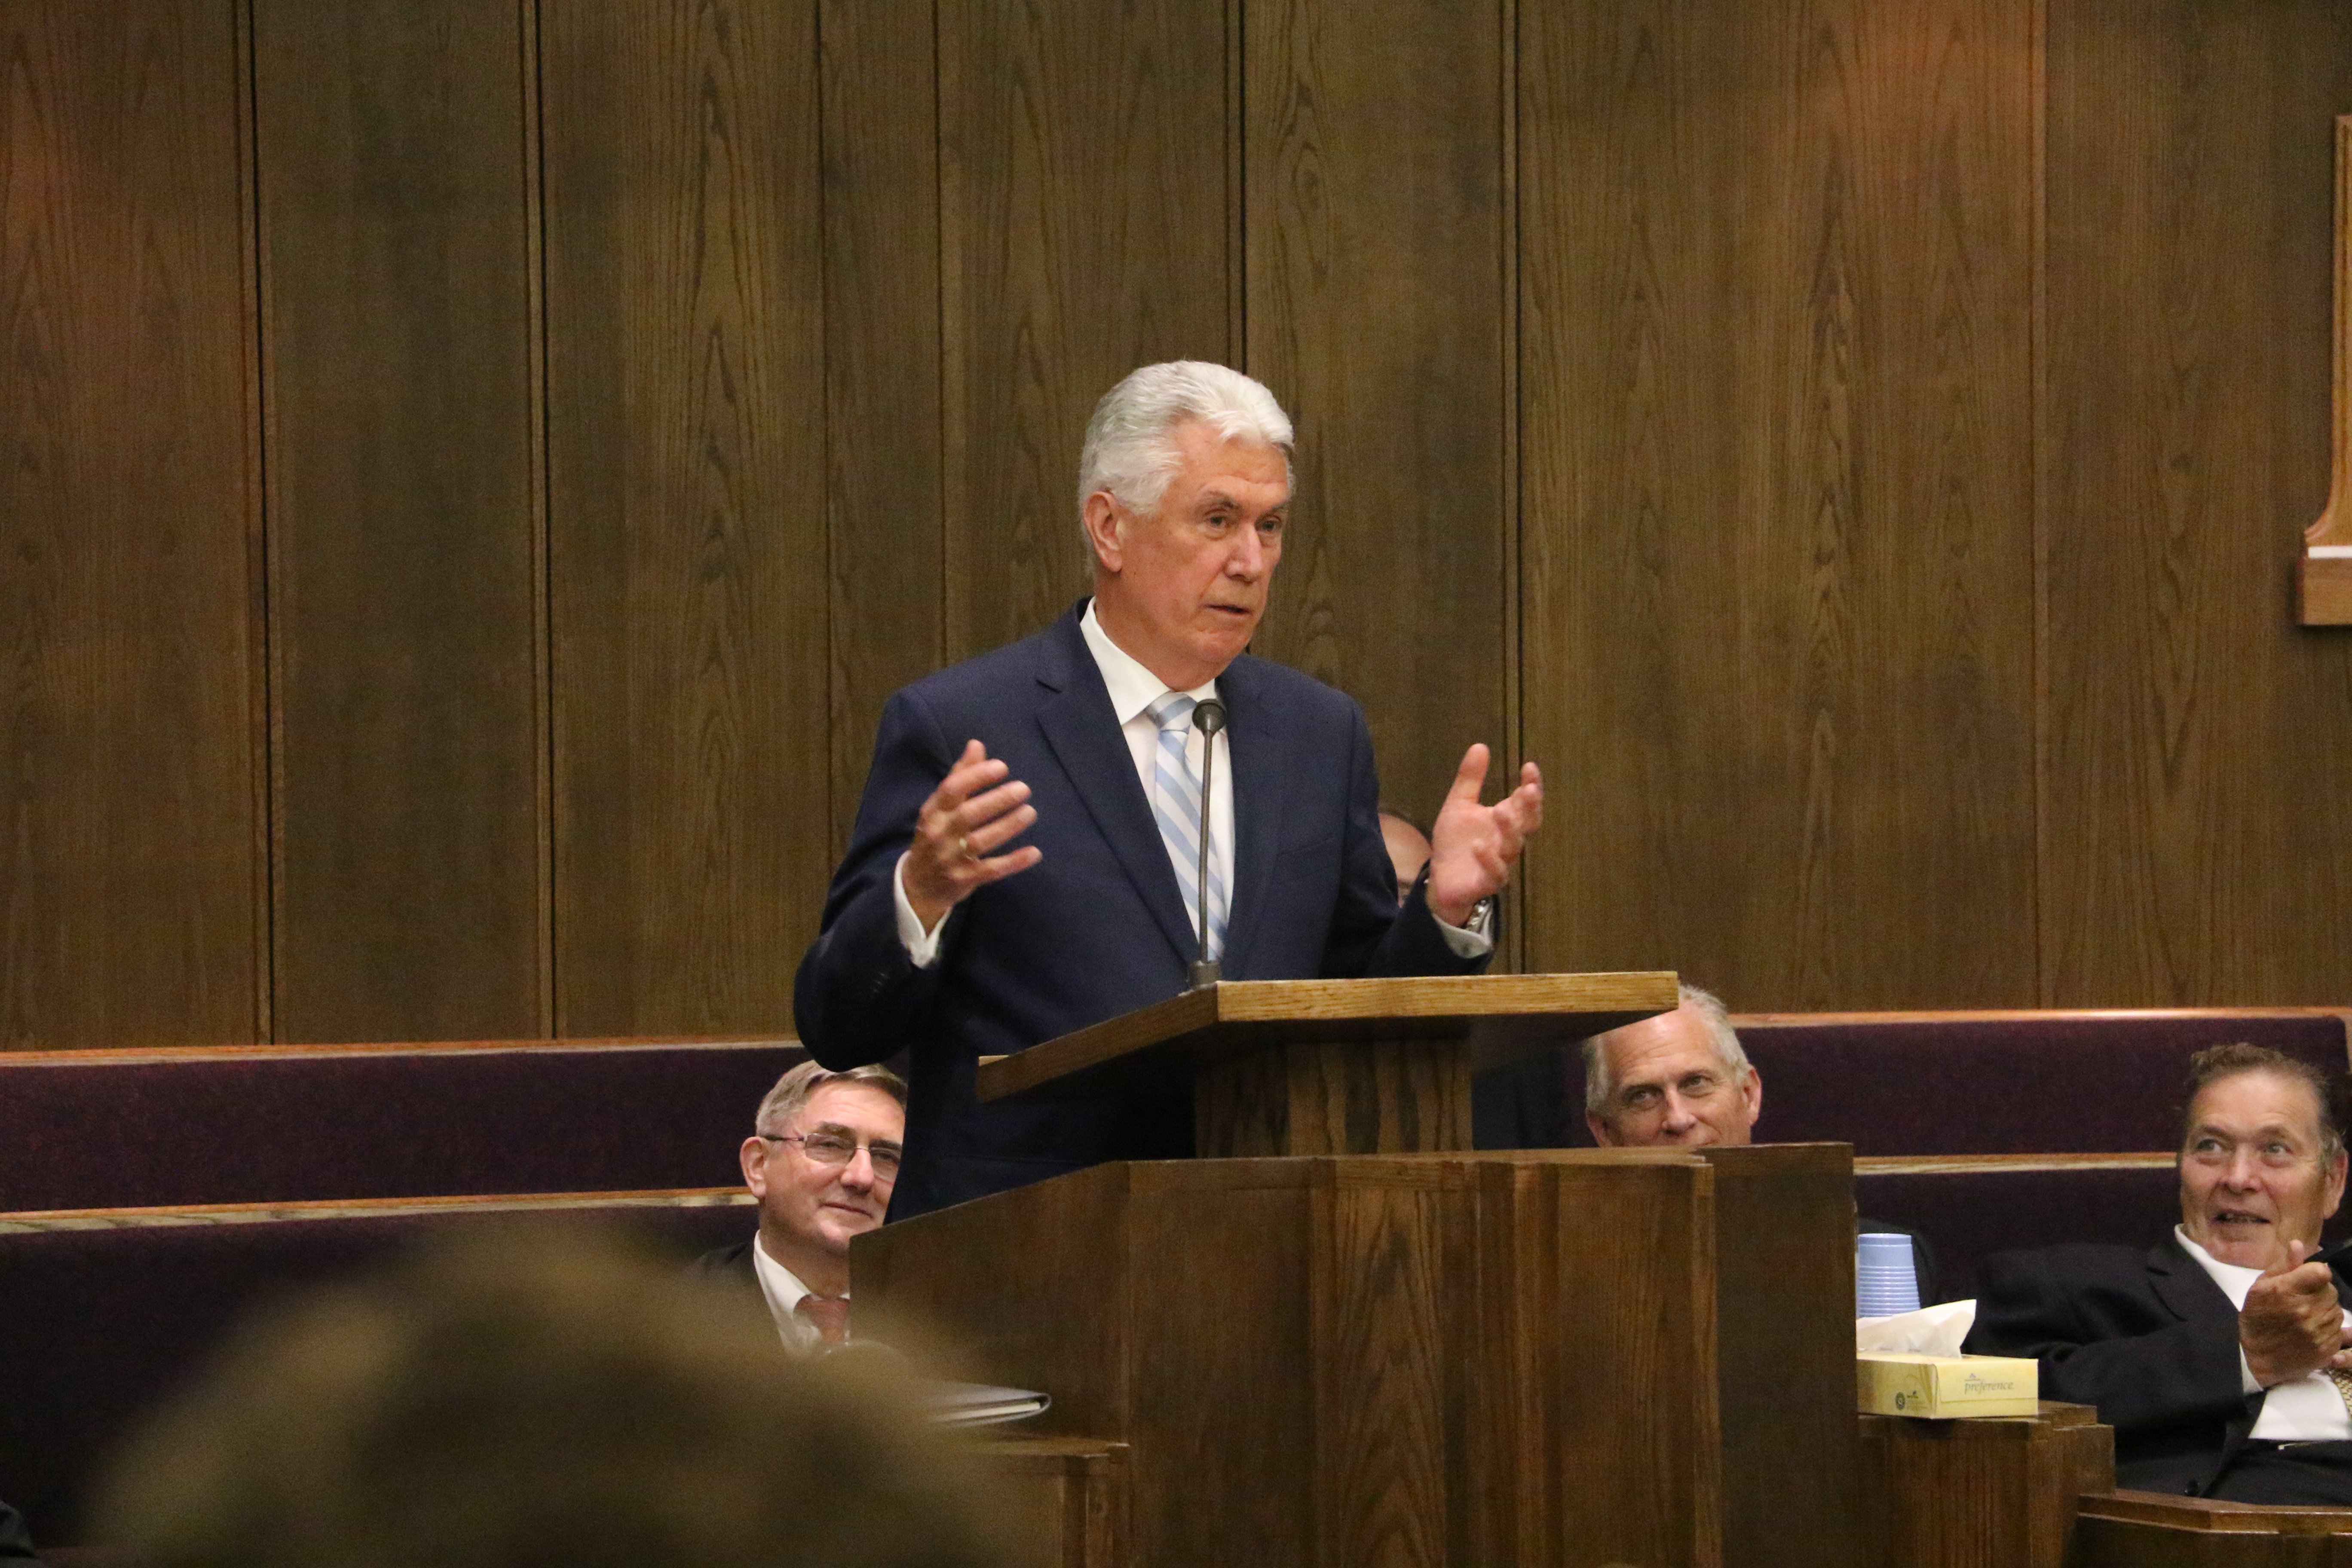 Elder Dieter F. Uchtdorf of the Quorum of the Twelve Apostles speaks during the German Speaking Ward's final sacrament meeting on July 14, 2019, in Salt Lake City.